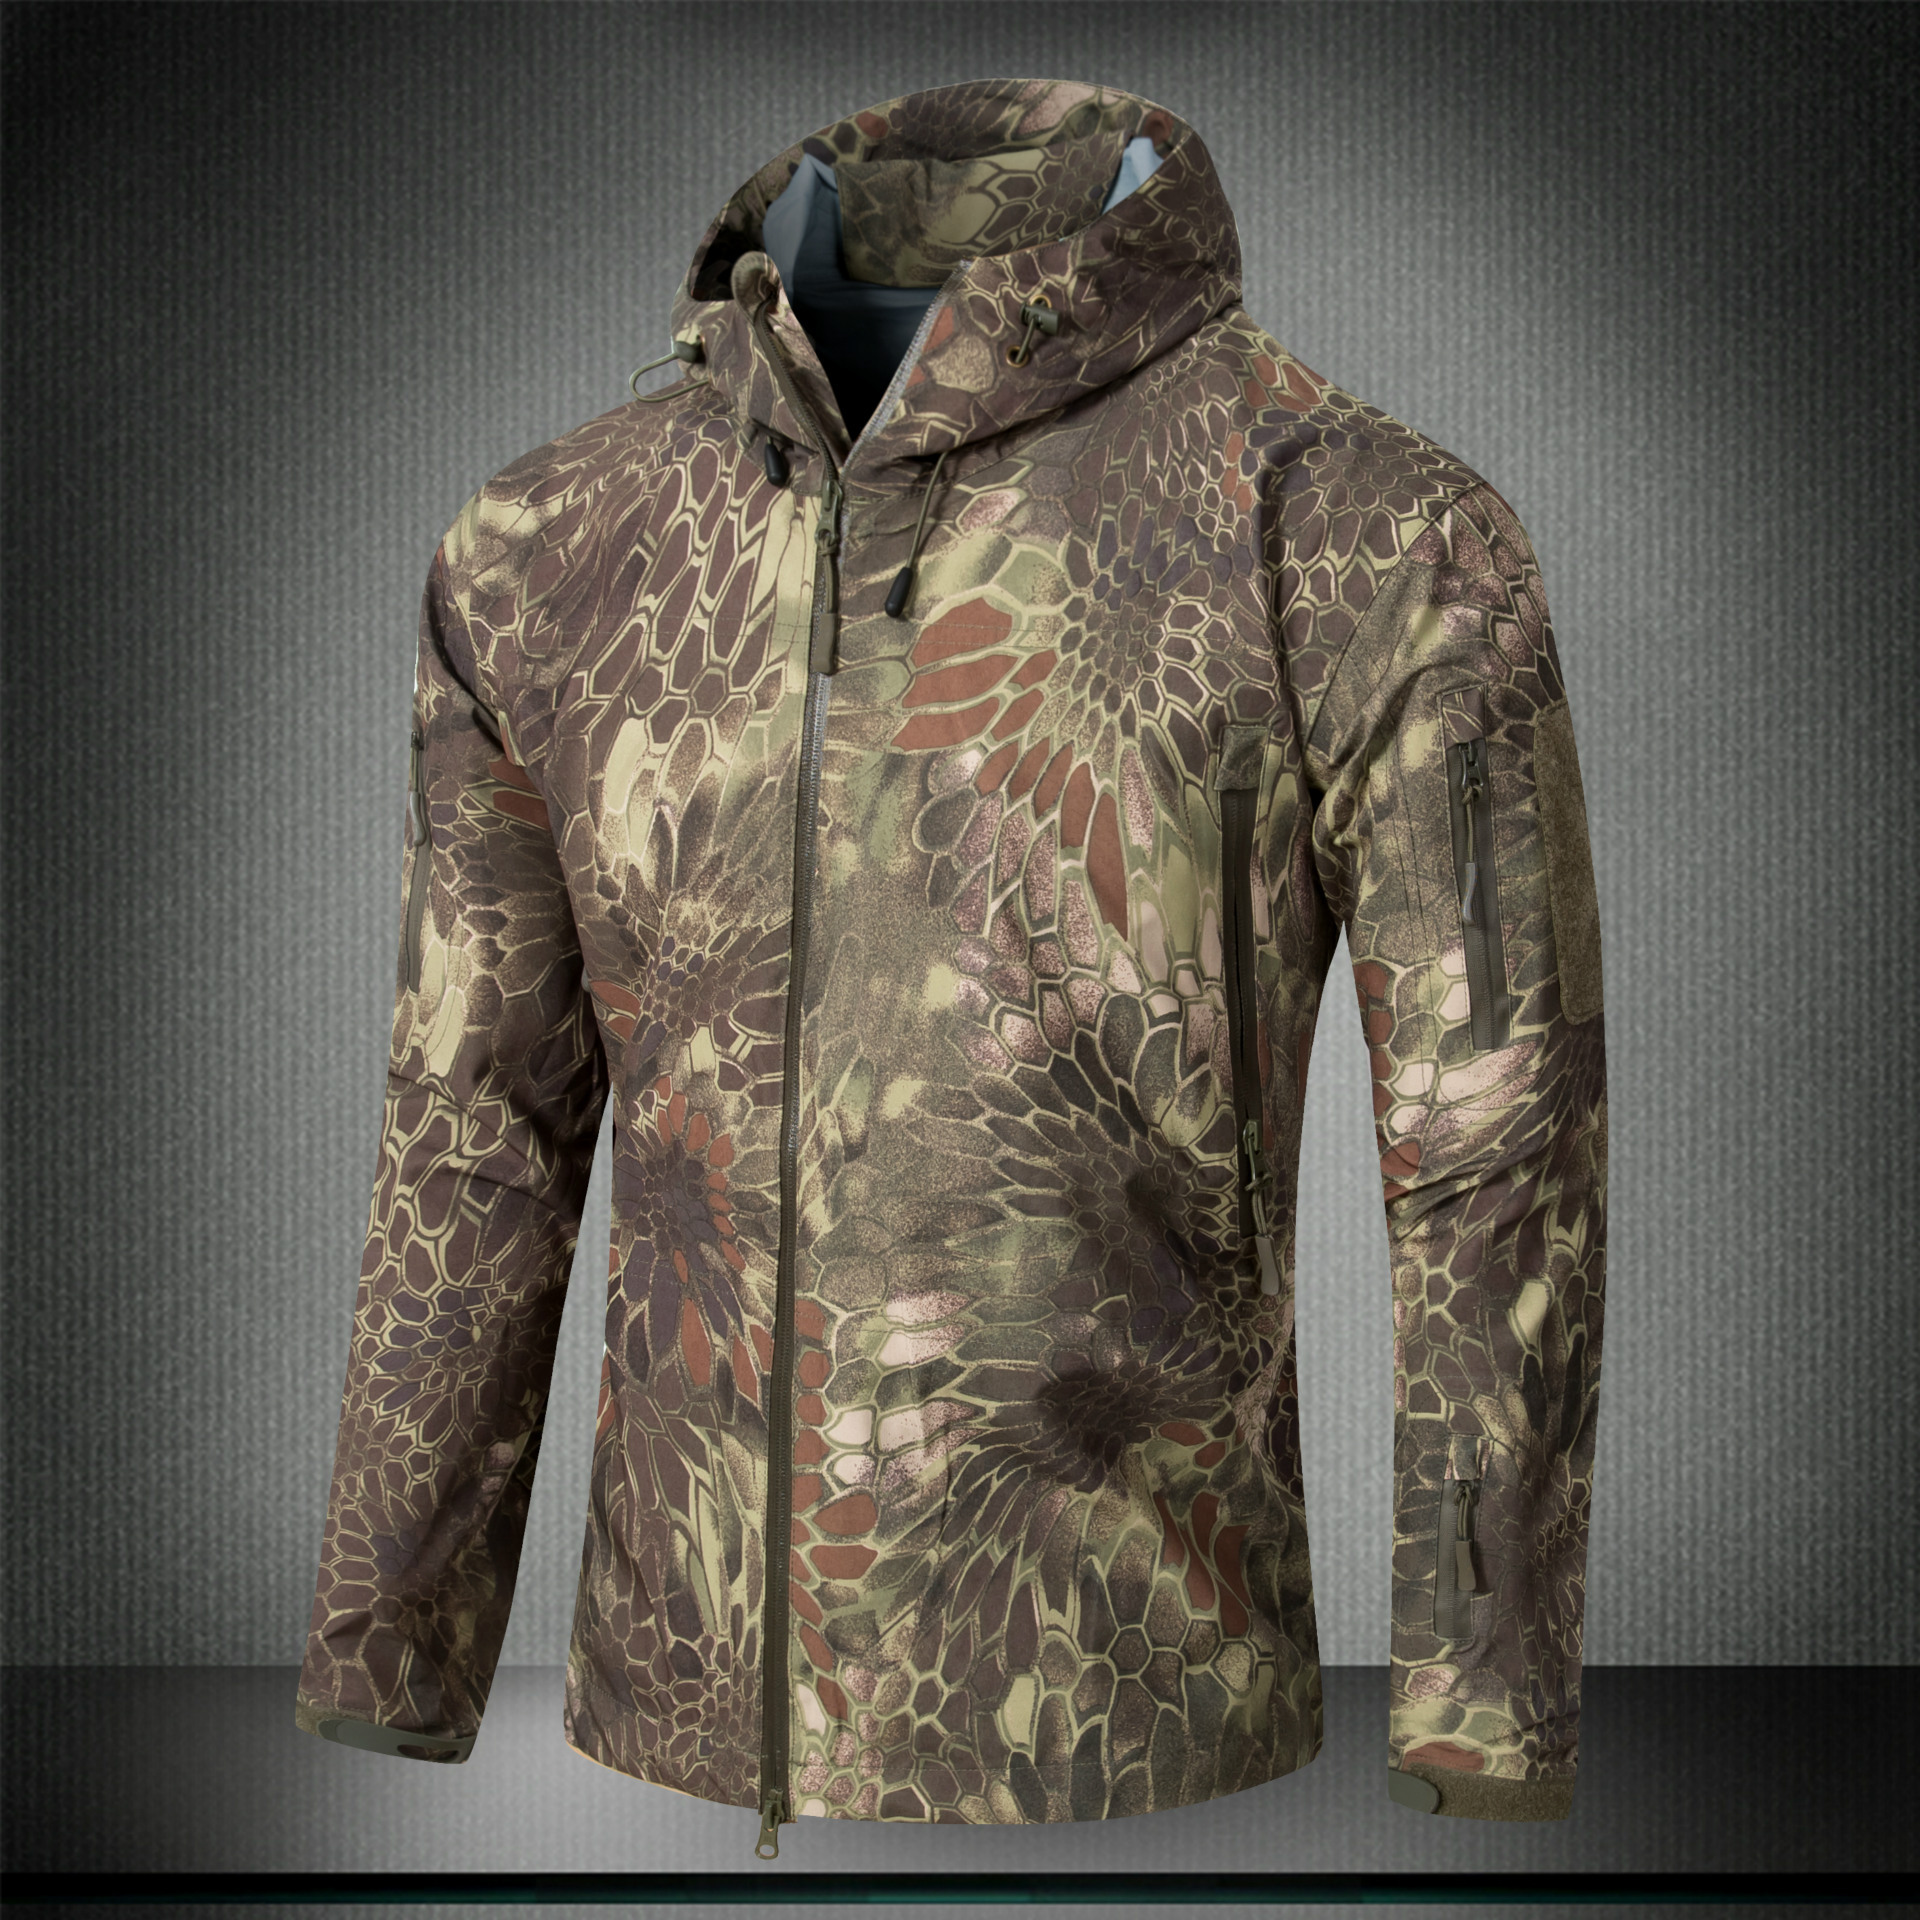 Mandrake Men's Waterproof Windproof Softshell Fleece Army Tactical Outdoor Casual Jacket Coat With Hood